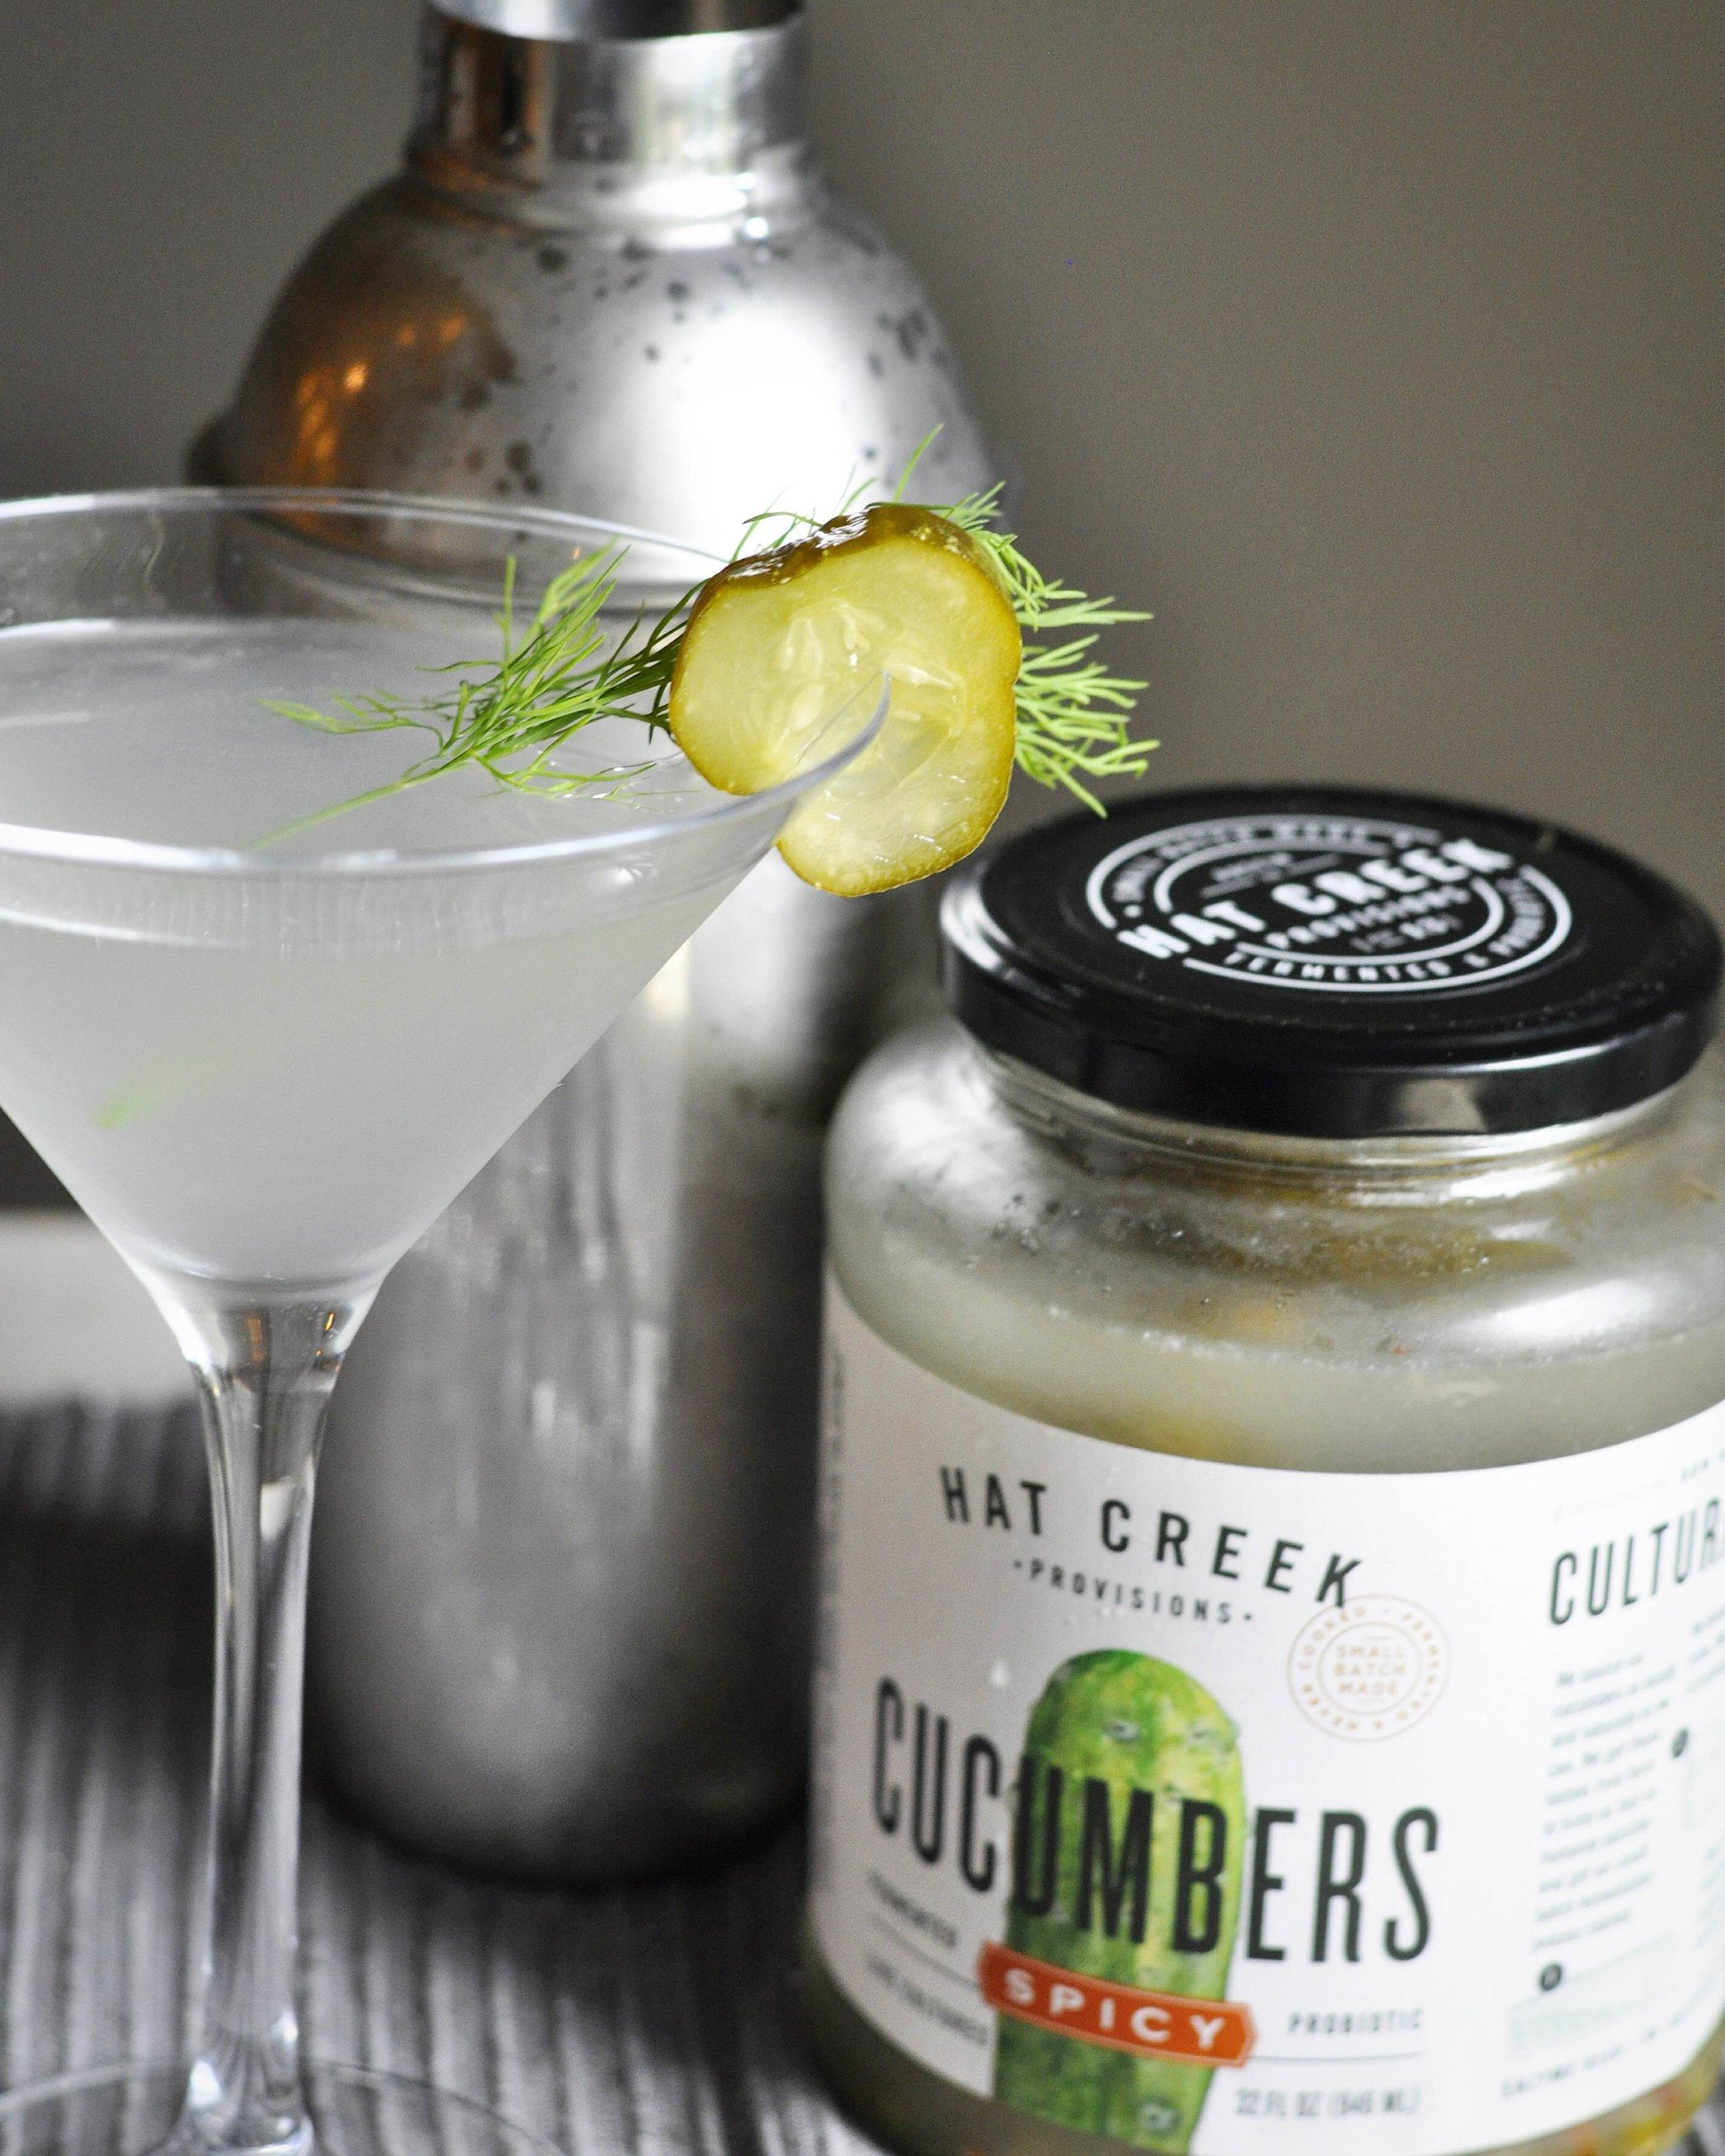 Unique martini recipe